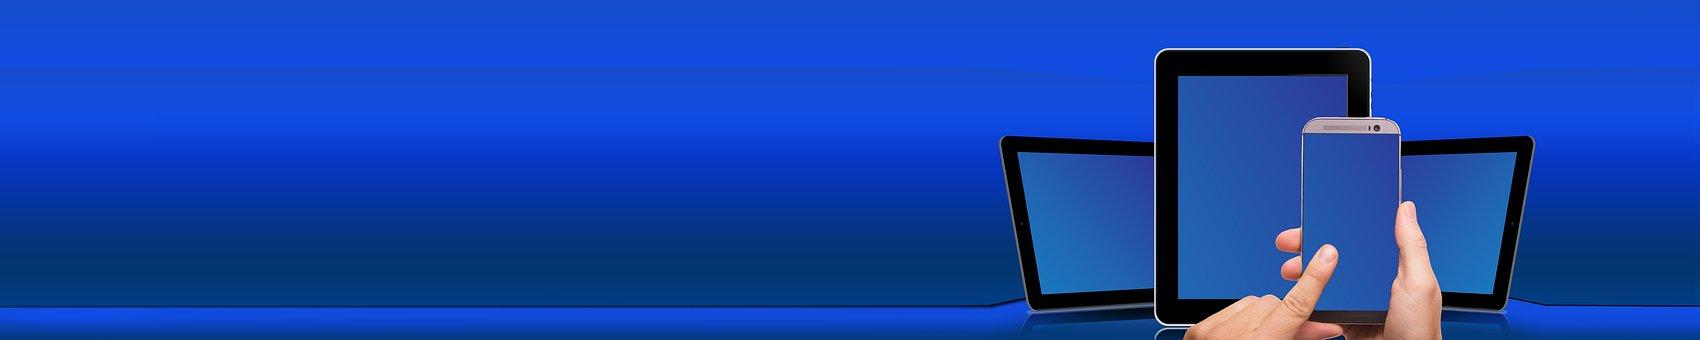 Computer, Smartphone, Online, Digital, Banner, Header